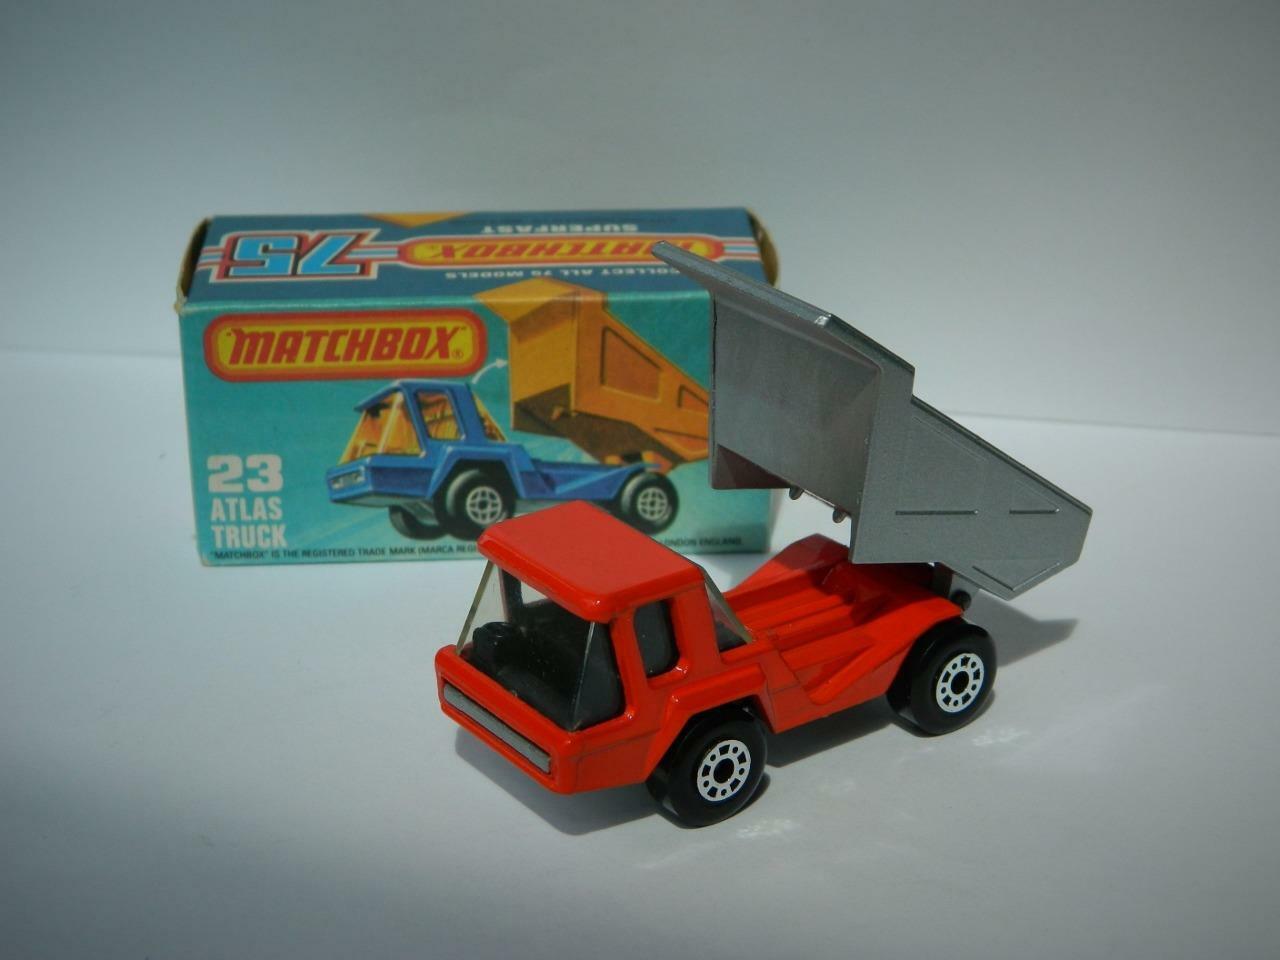 Matchbox Lesney súperfast en caja Atlas camión Raro Negro Interior No.23 vnmib 1981